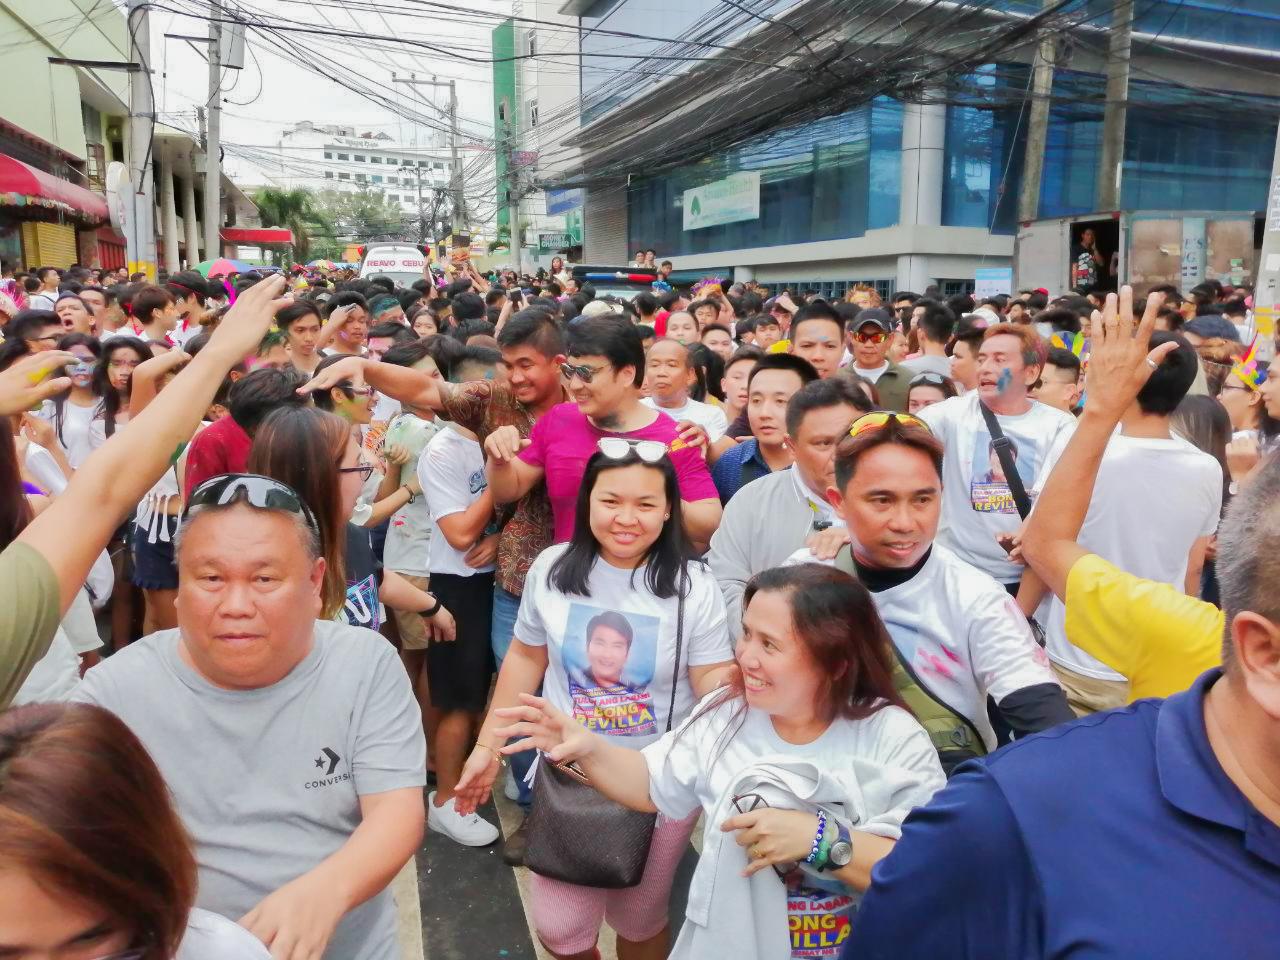 Sinulog, Cebu - January 20, 2019